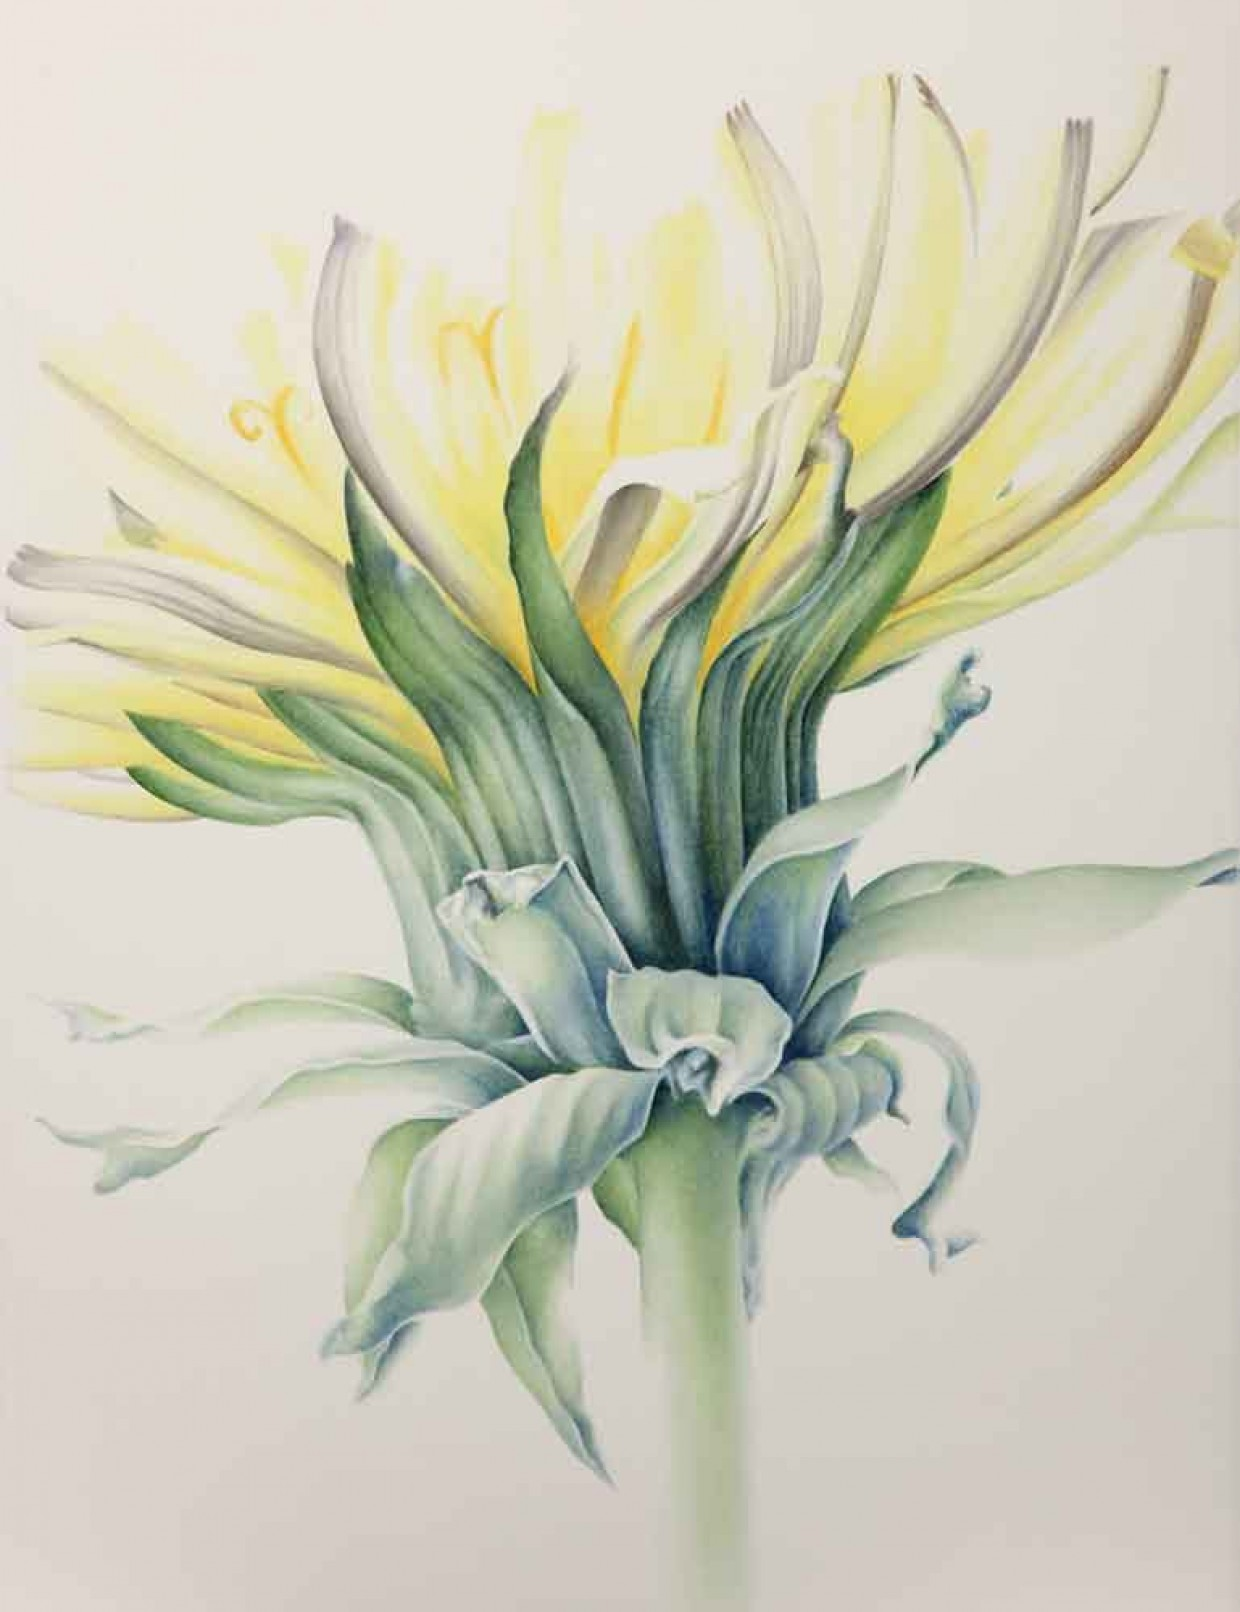 ``Dandelion`` Water color on paper, Minako Watanabe